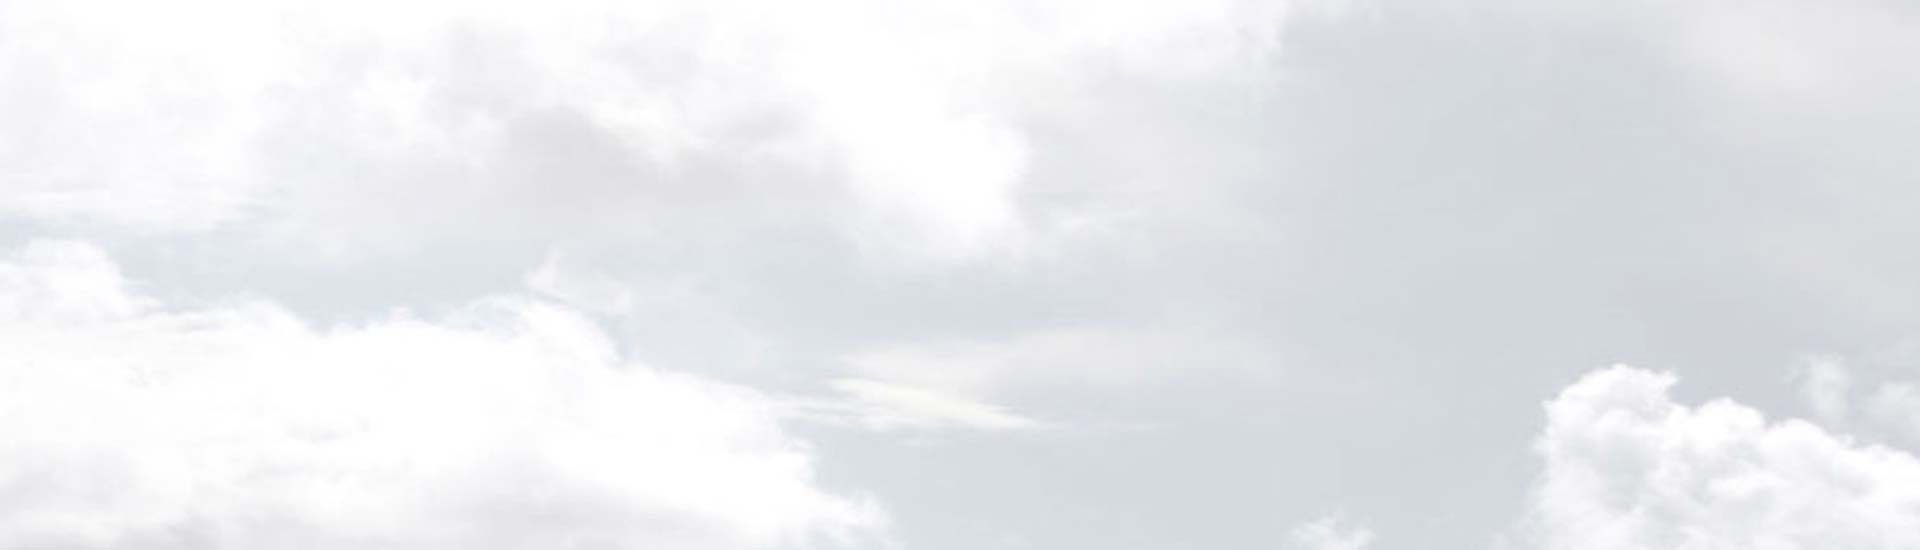 sheeran-background2